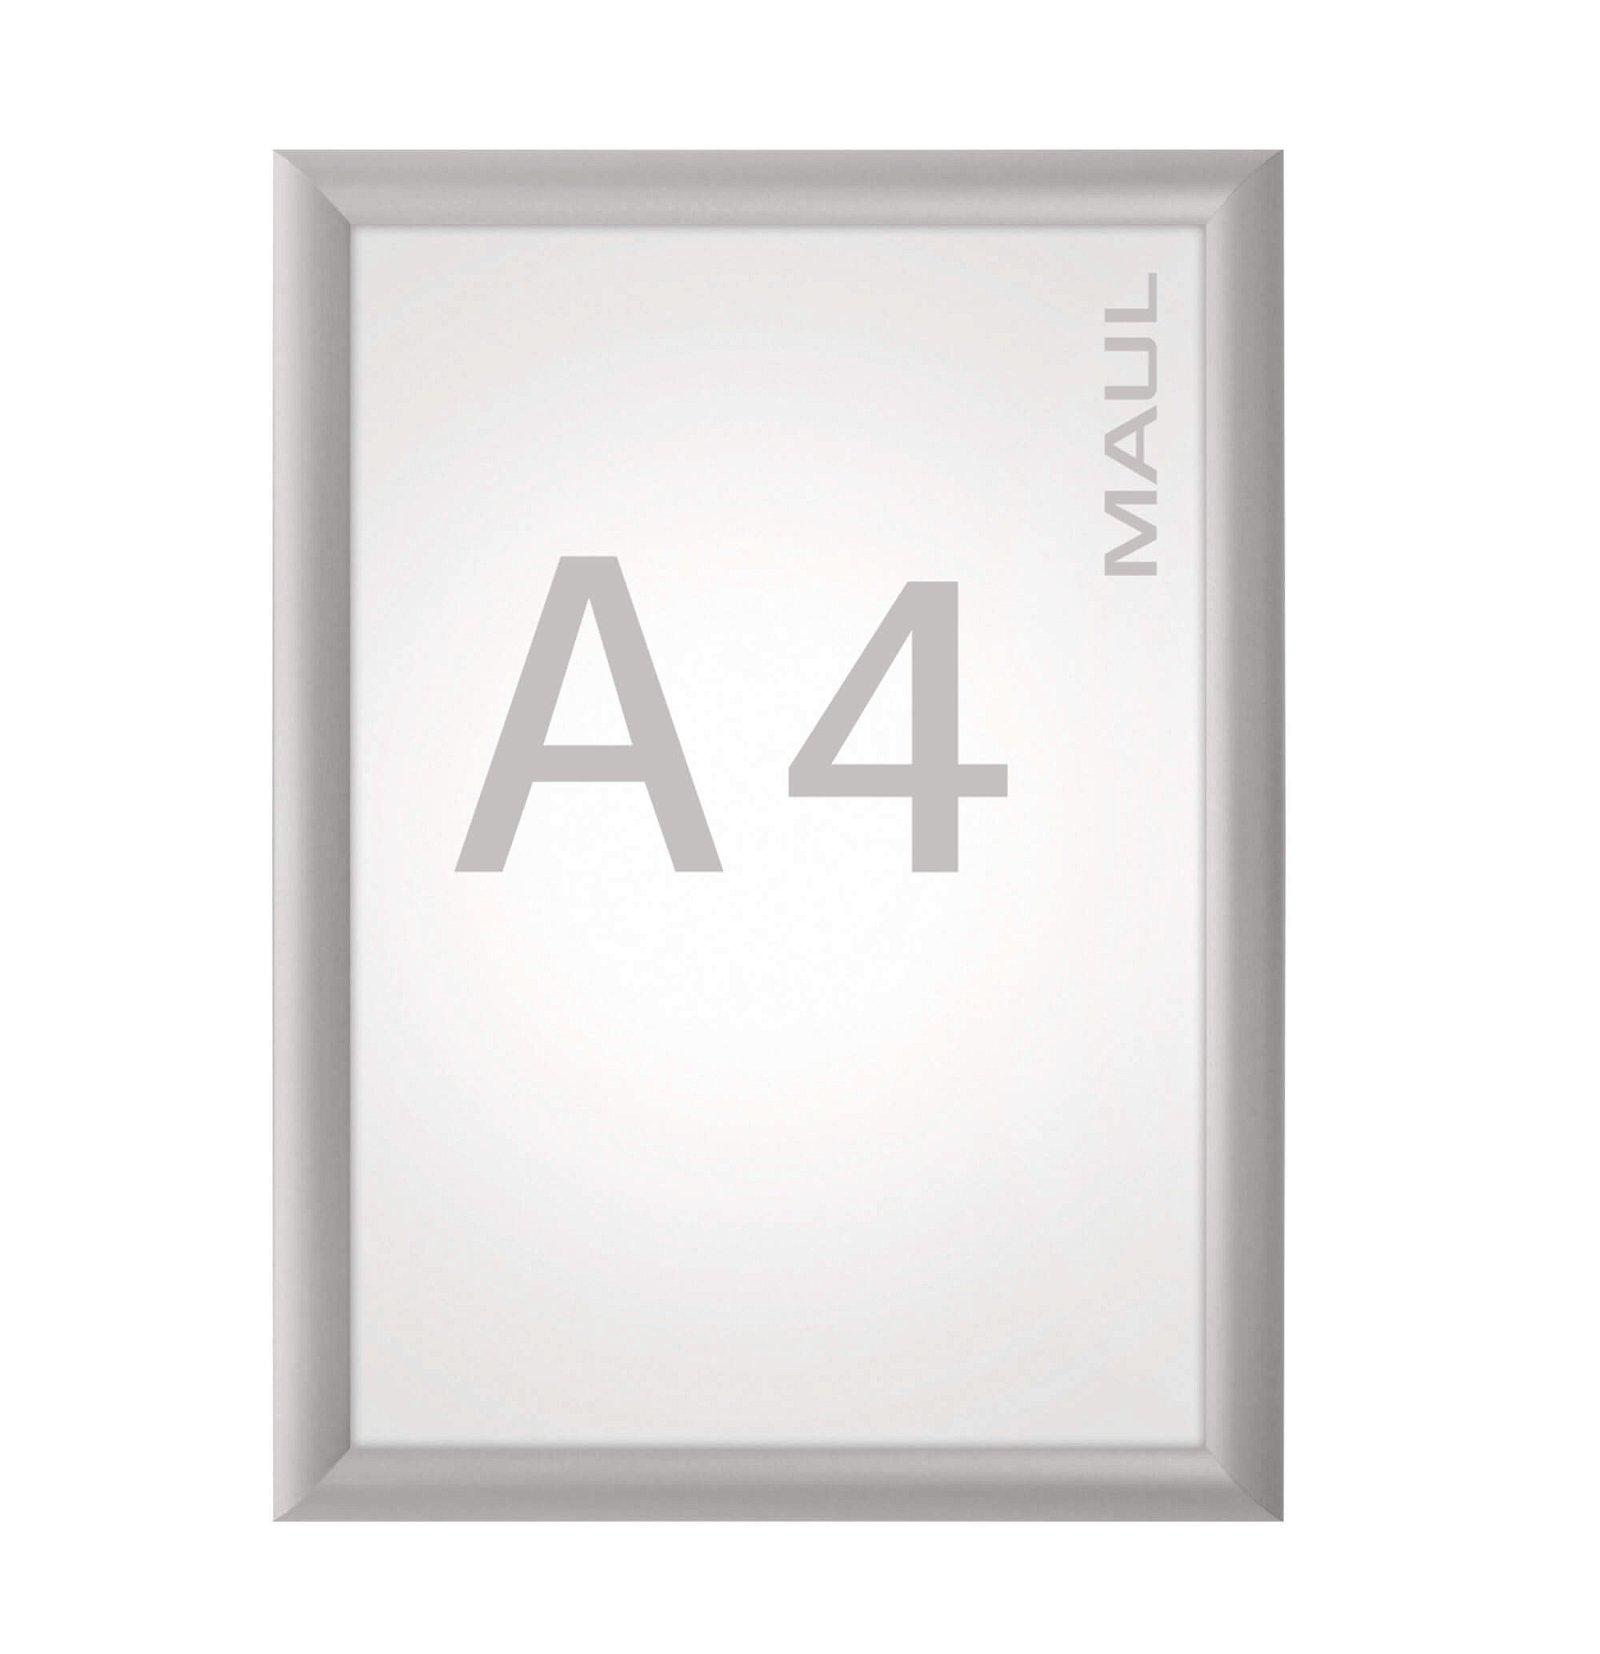 Klapprahmen MAULstandard, A4, aluminium